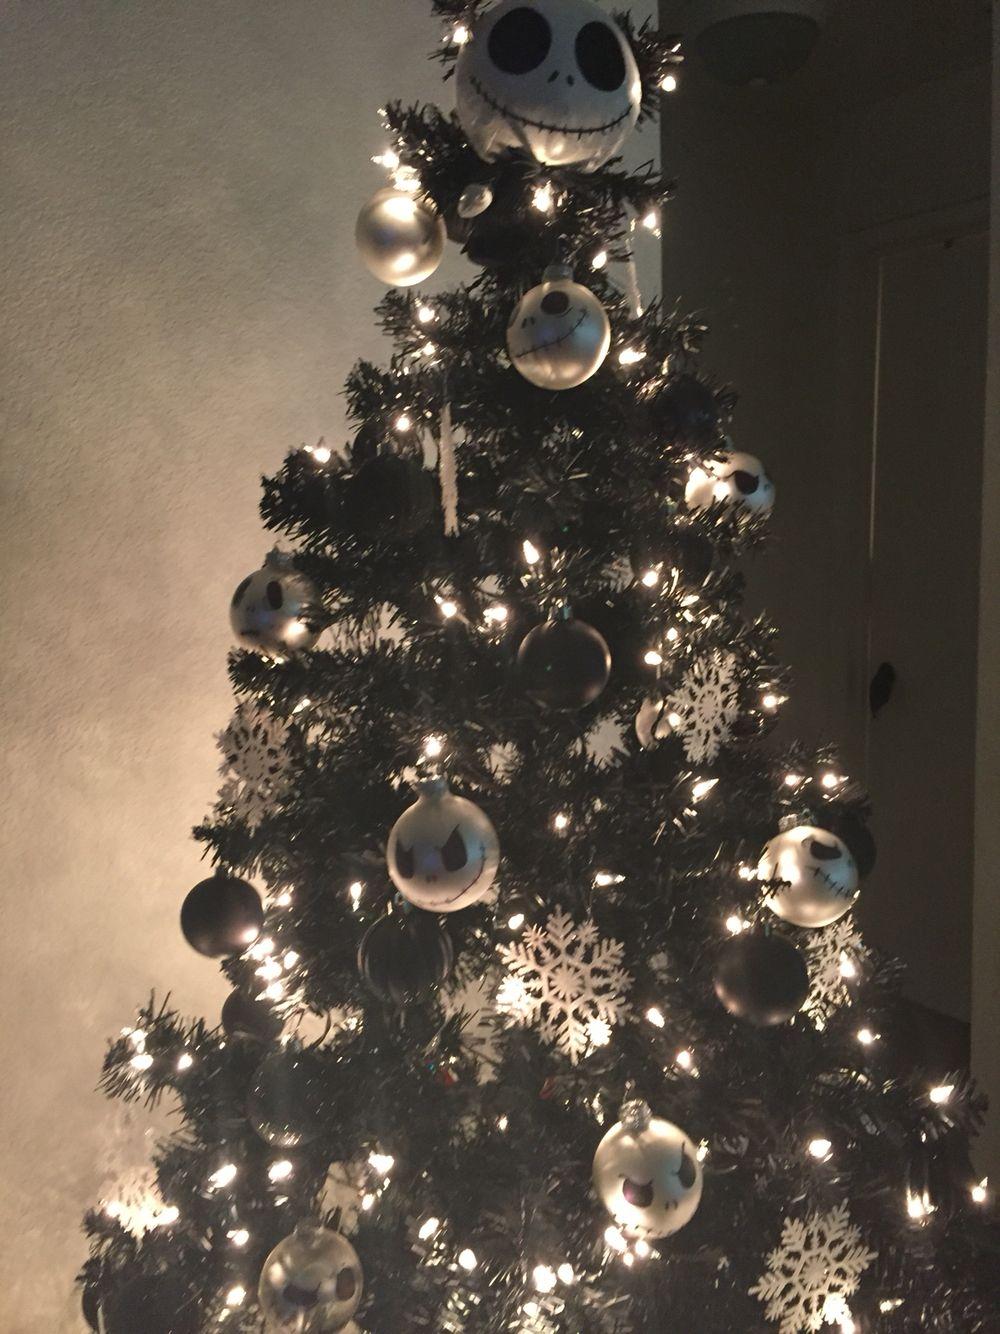 The Nightmare Before Christmas Tree Tattoo Nightmare Before